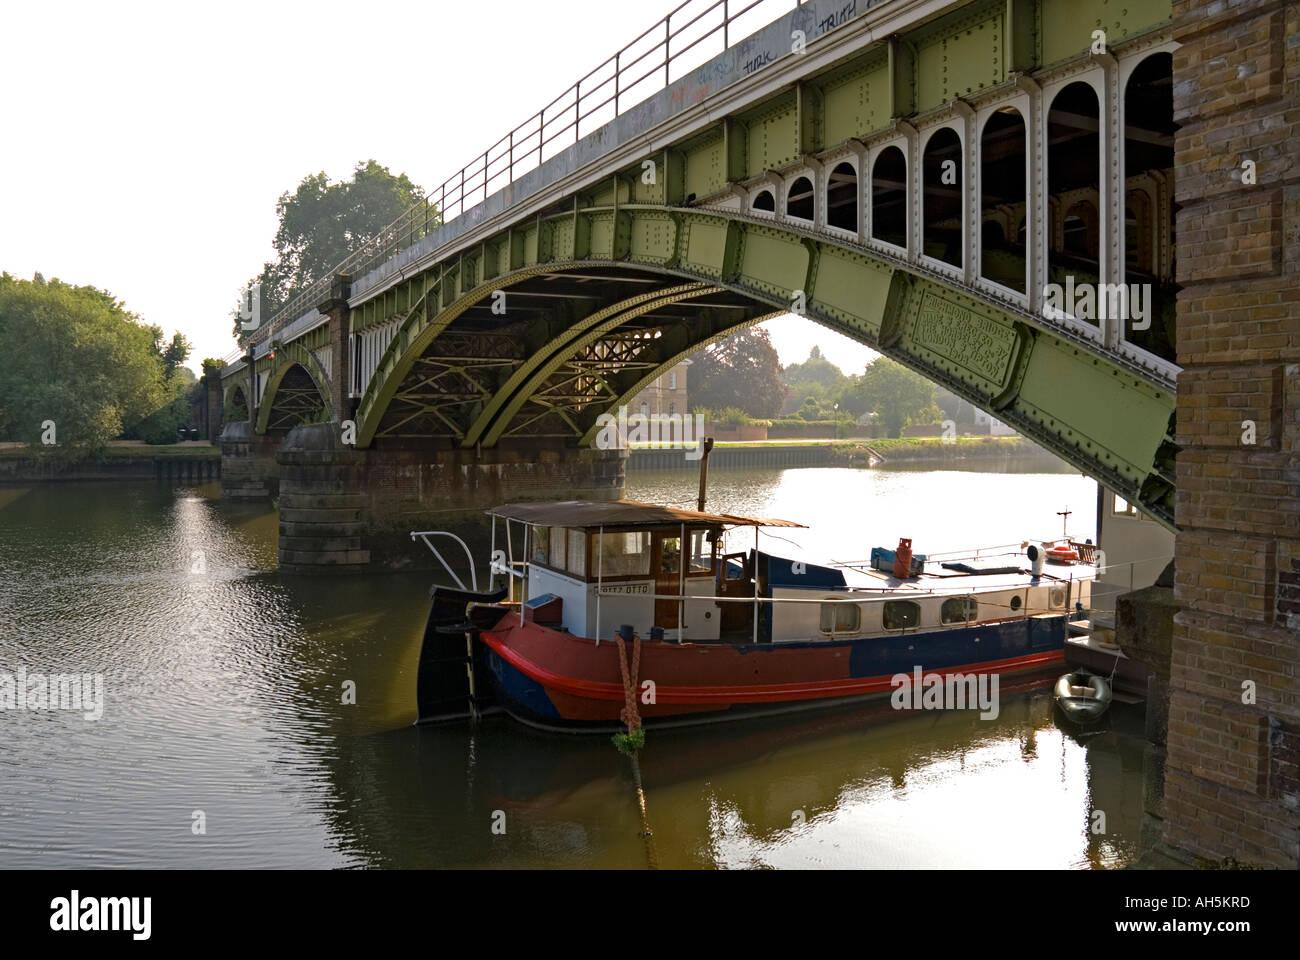 Richmond railway bridge on the River Thames London - Stock Image